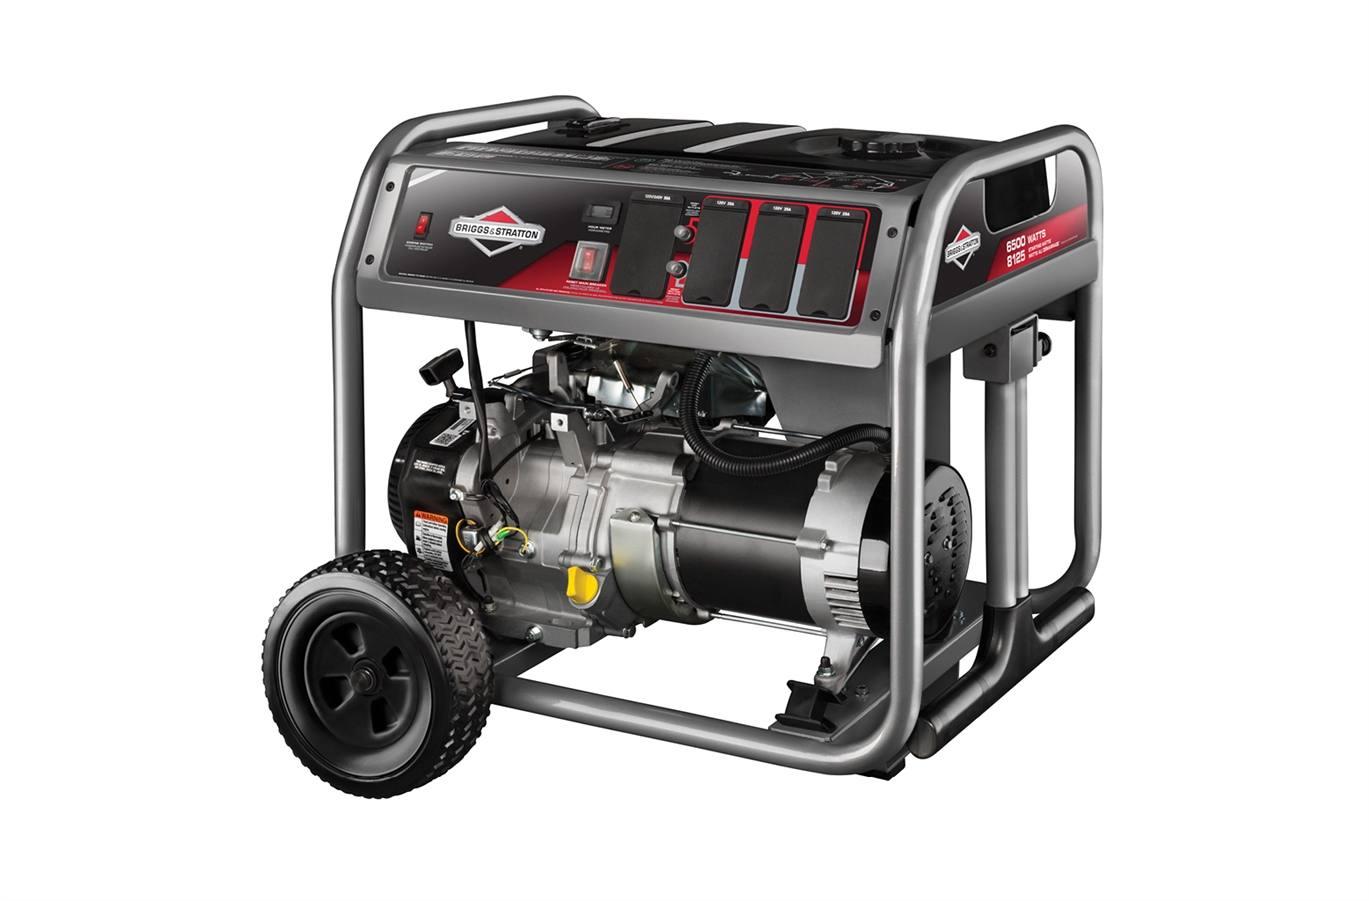 2018 Briggs & Stratton 6500 Watt Portable Generator (30659